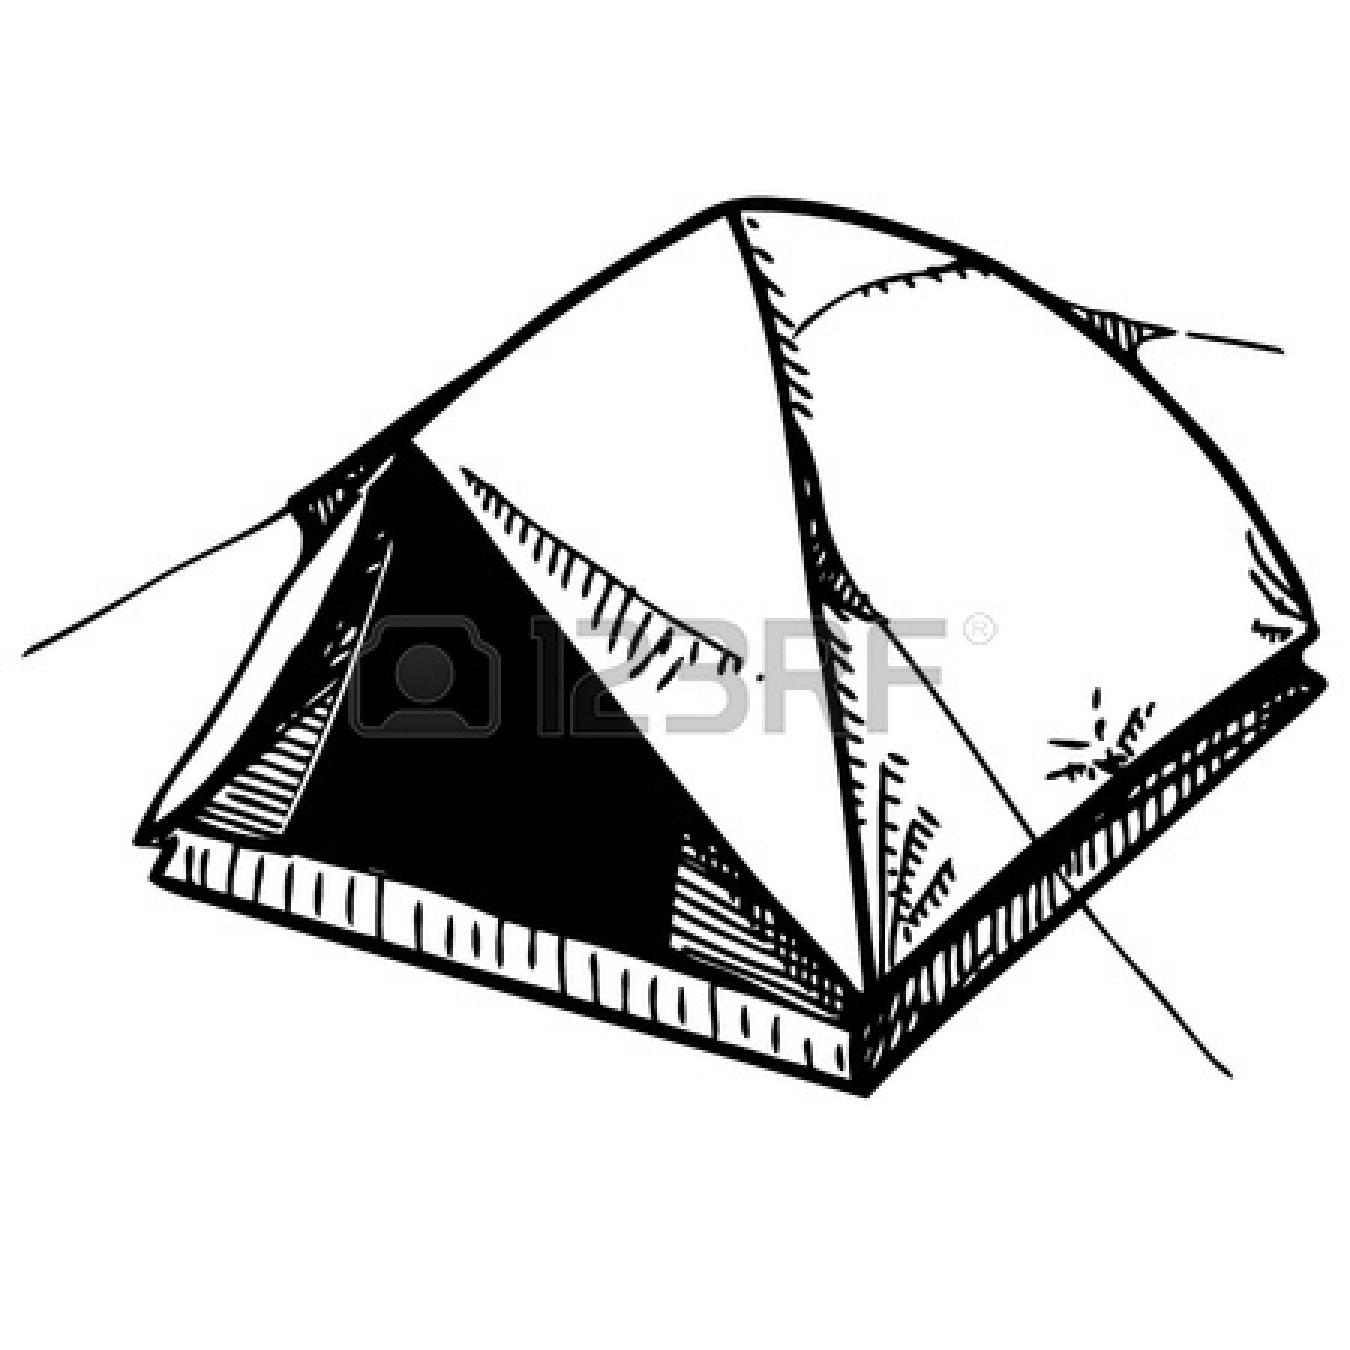 Cartoon Campfire And Tent Clipart Panda